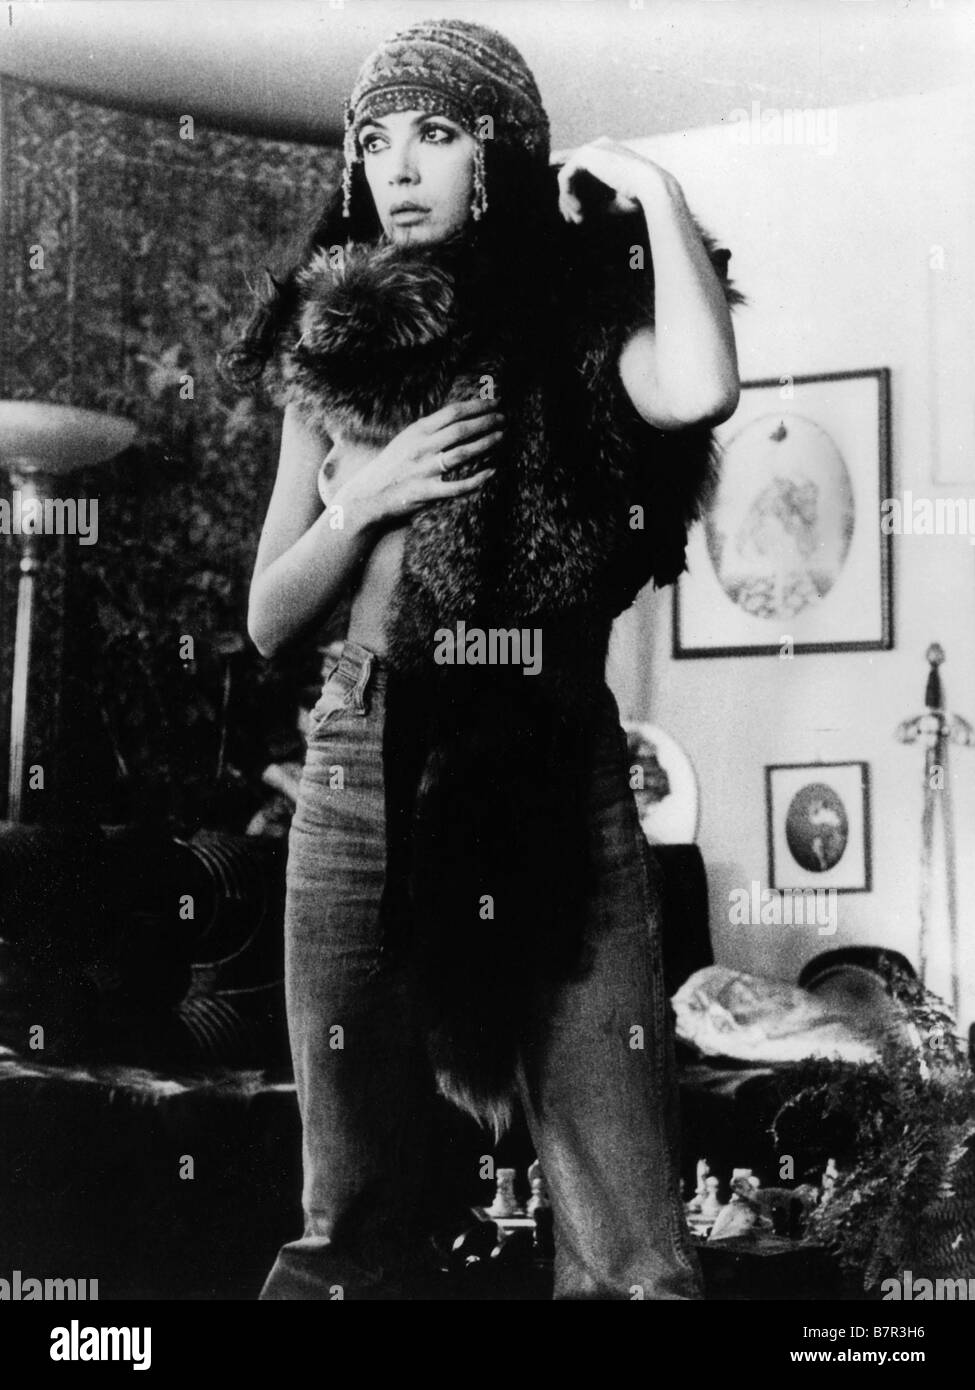 L'Ange et la femme Year: 1977 - Canada Director: Gill Carole Laure - Stock Image